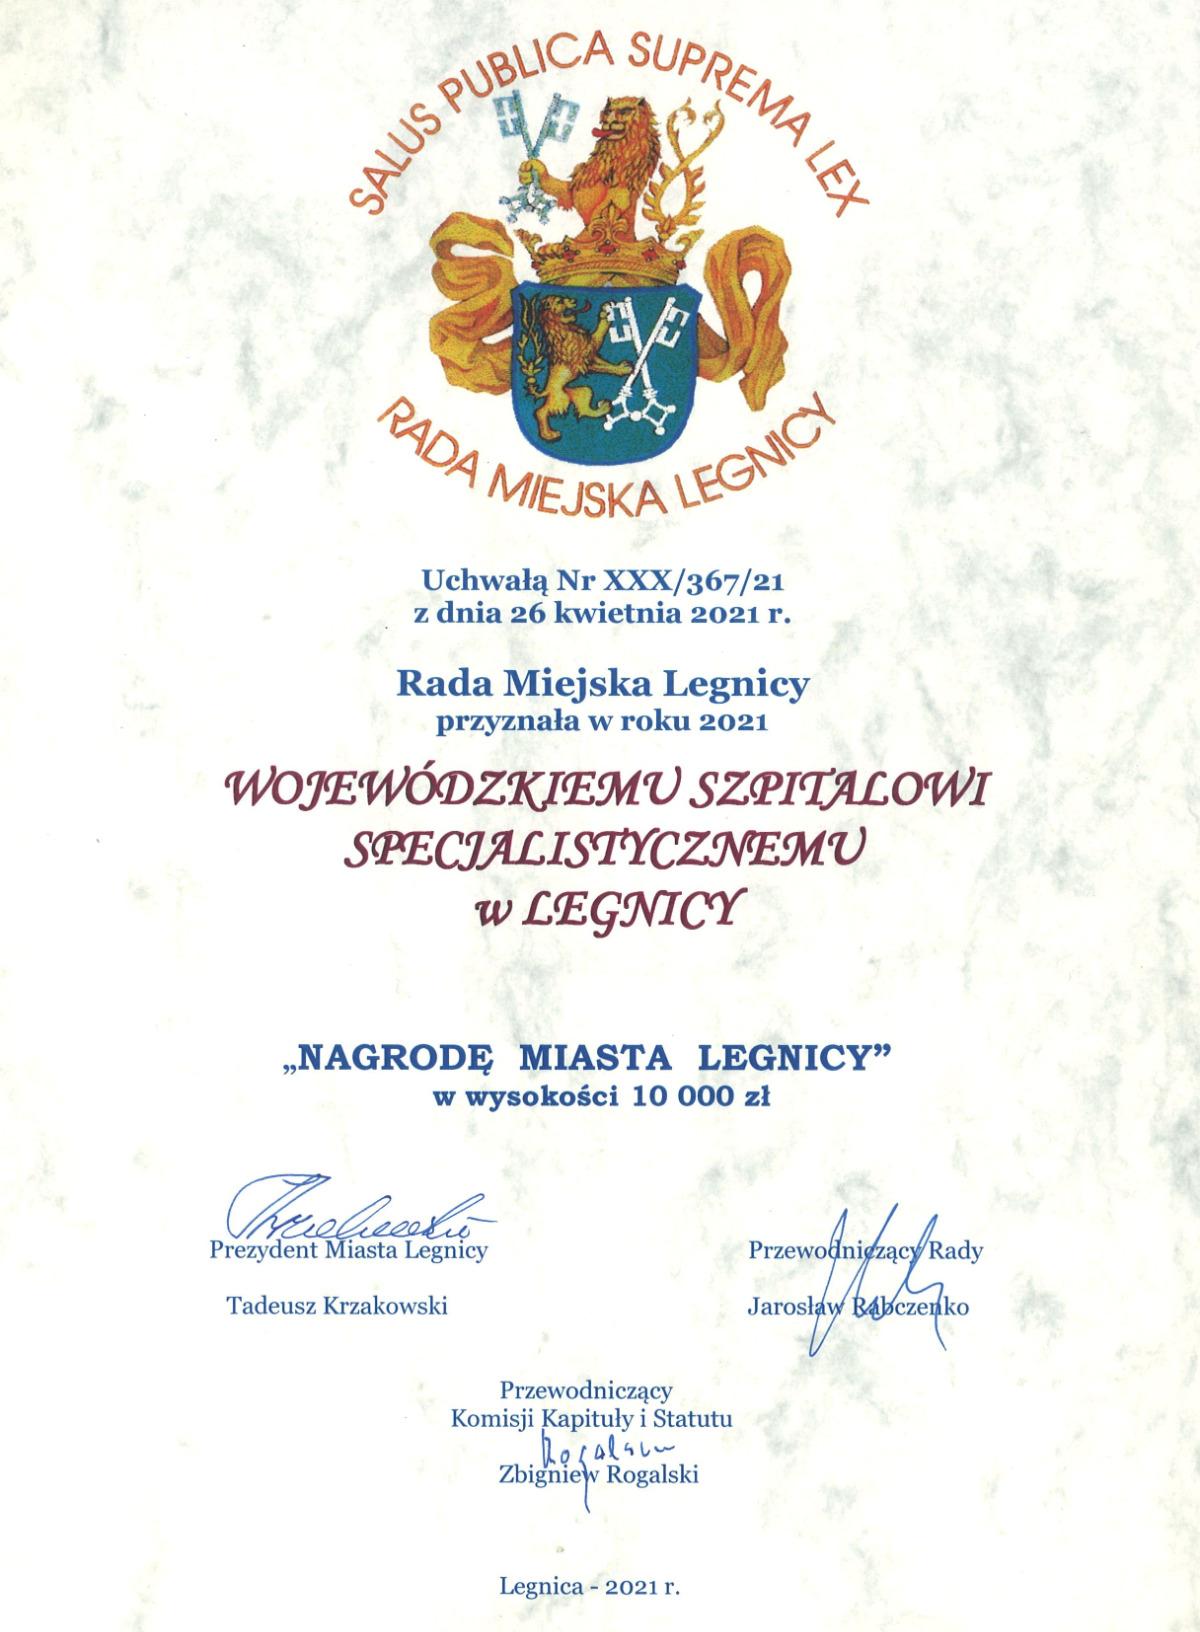 Nagroda Miasta Legnicy